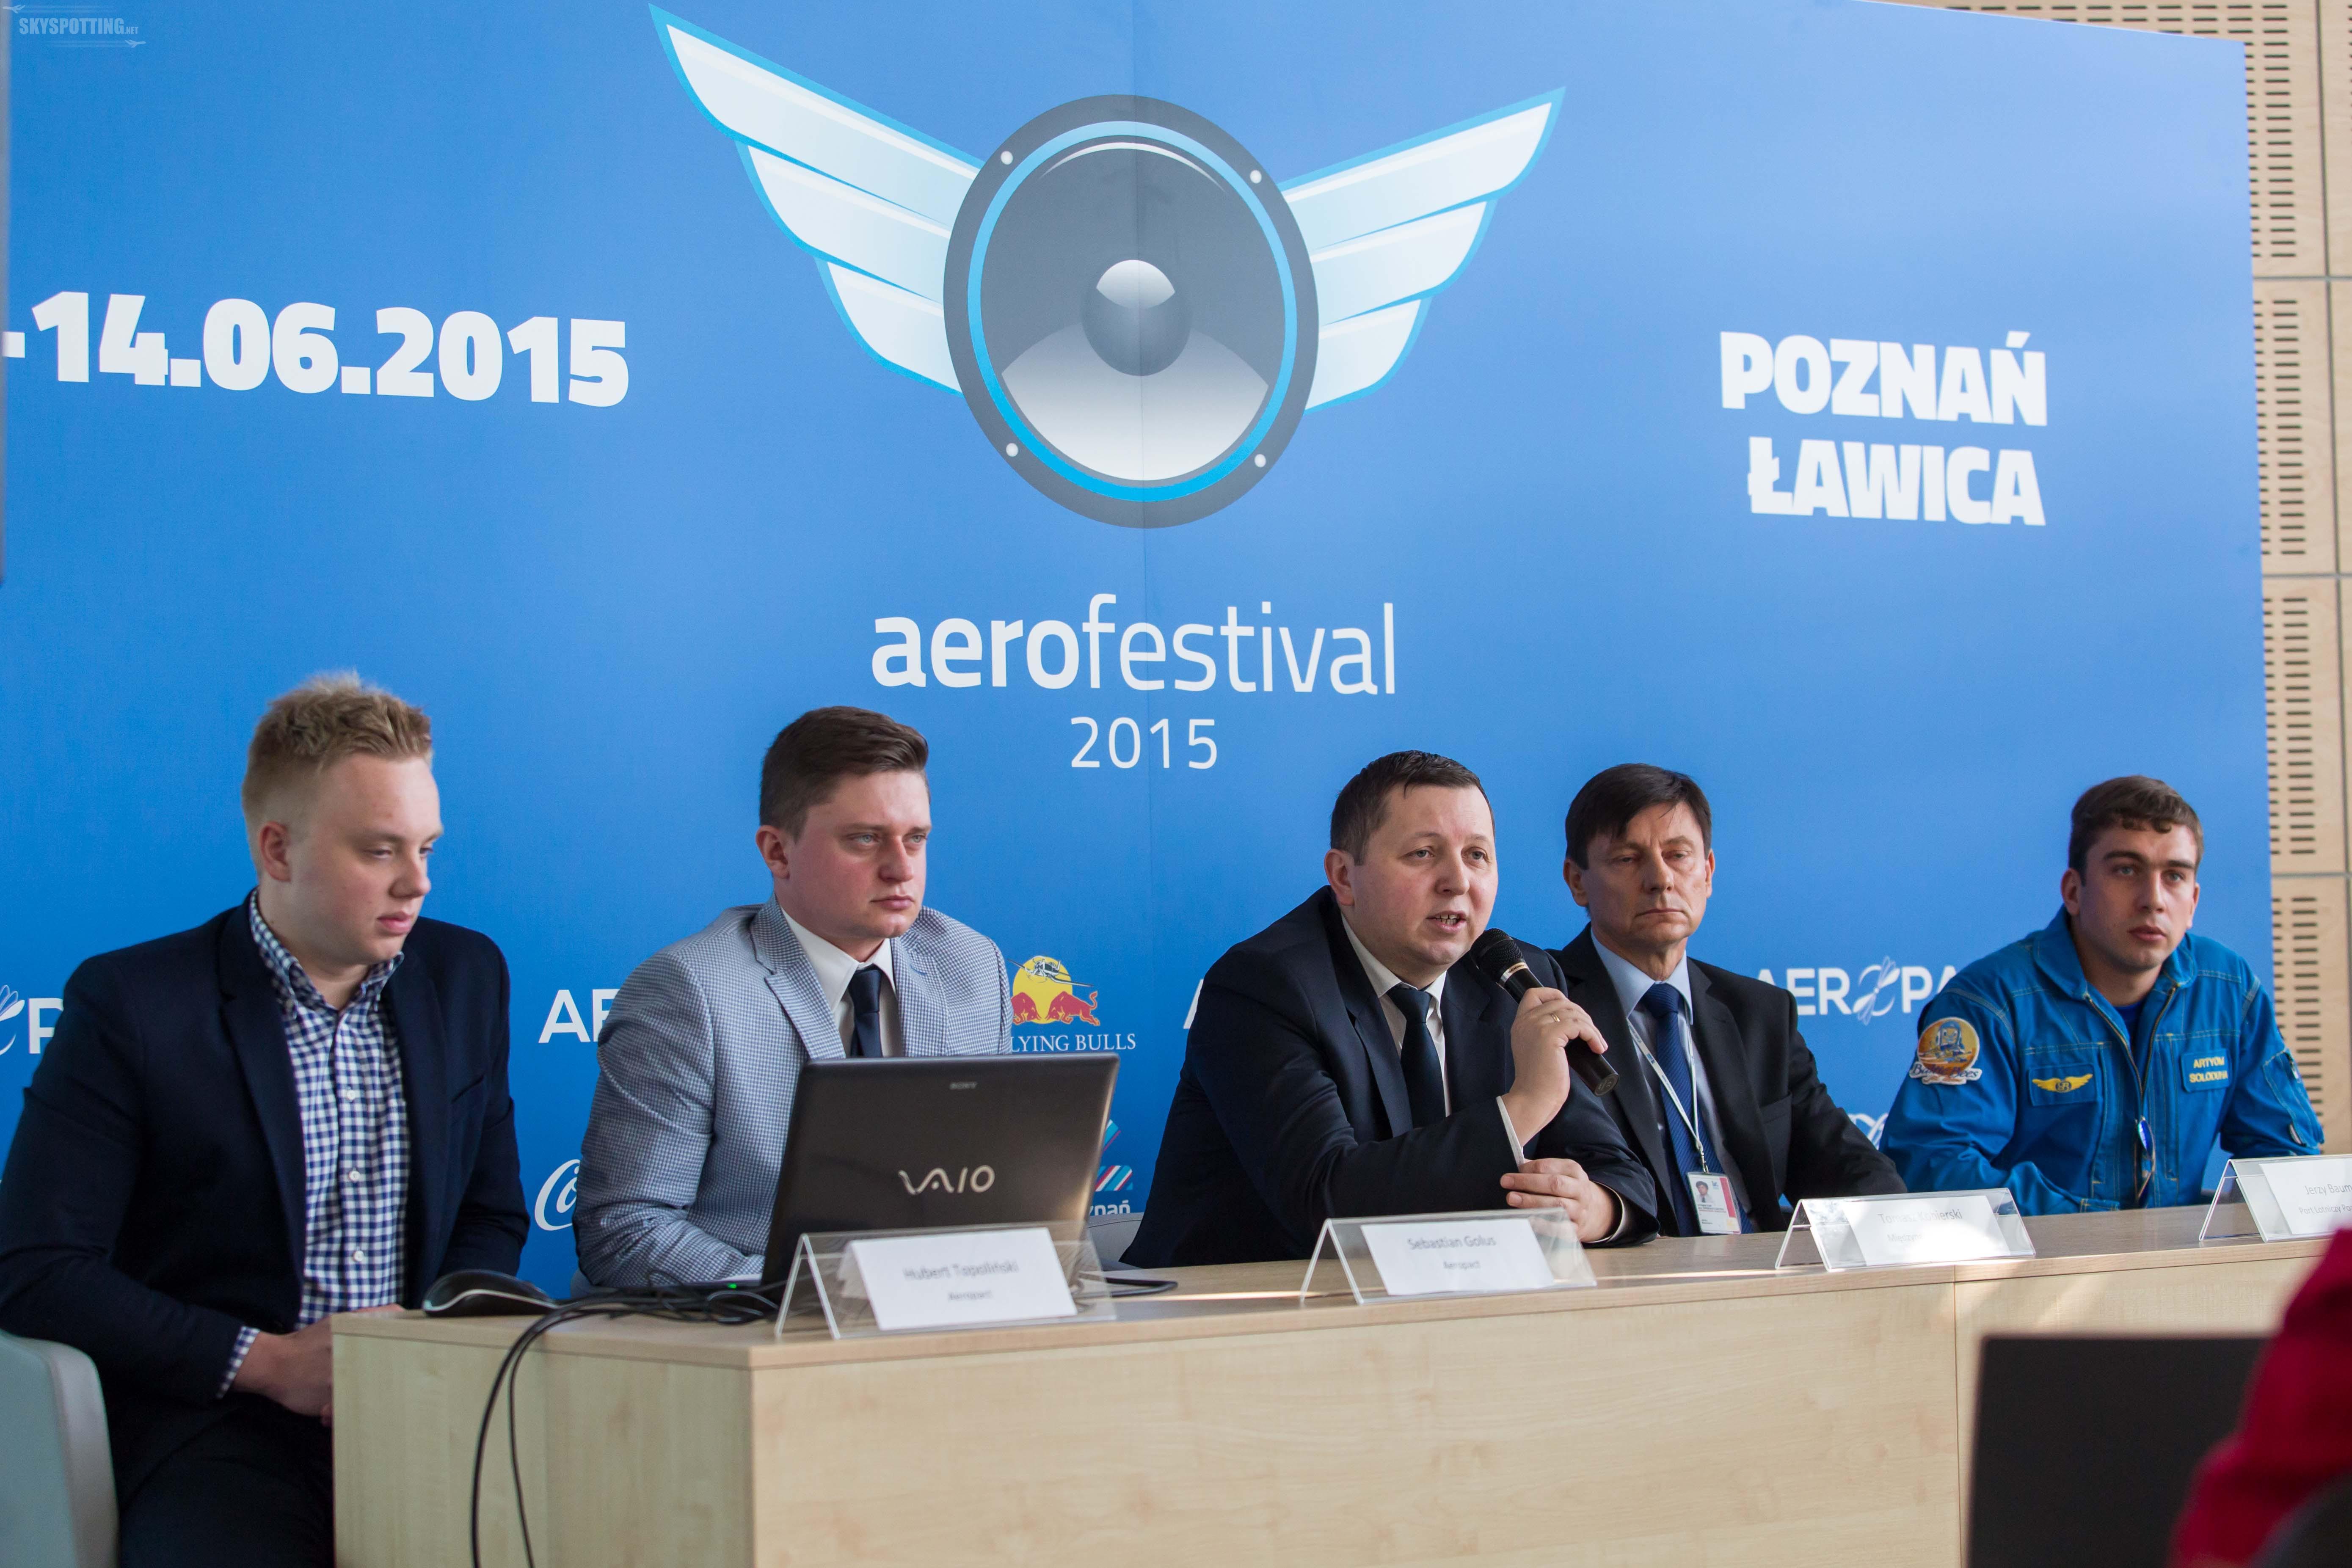 Aerofestival 2015 rozgrzewa silniki